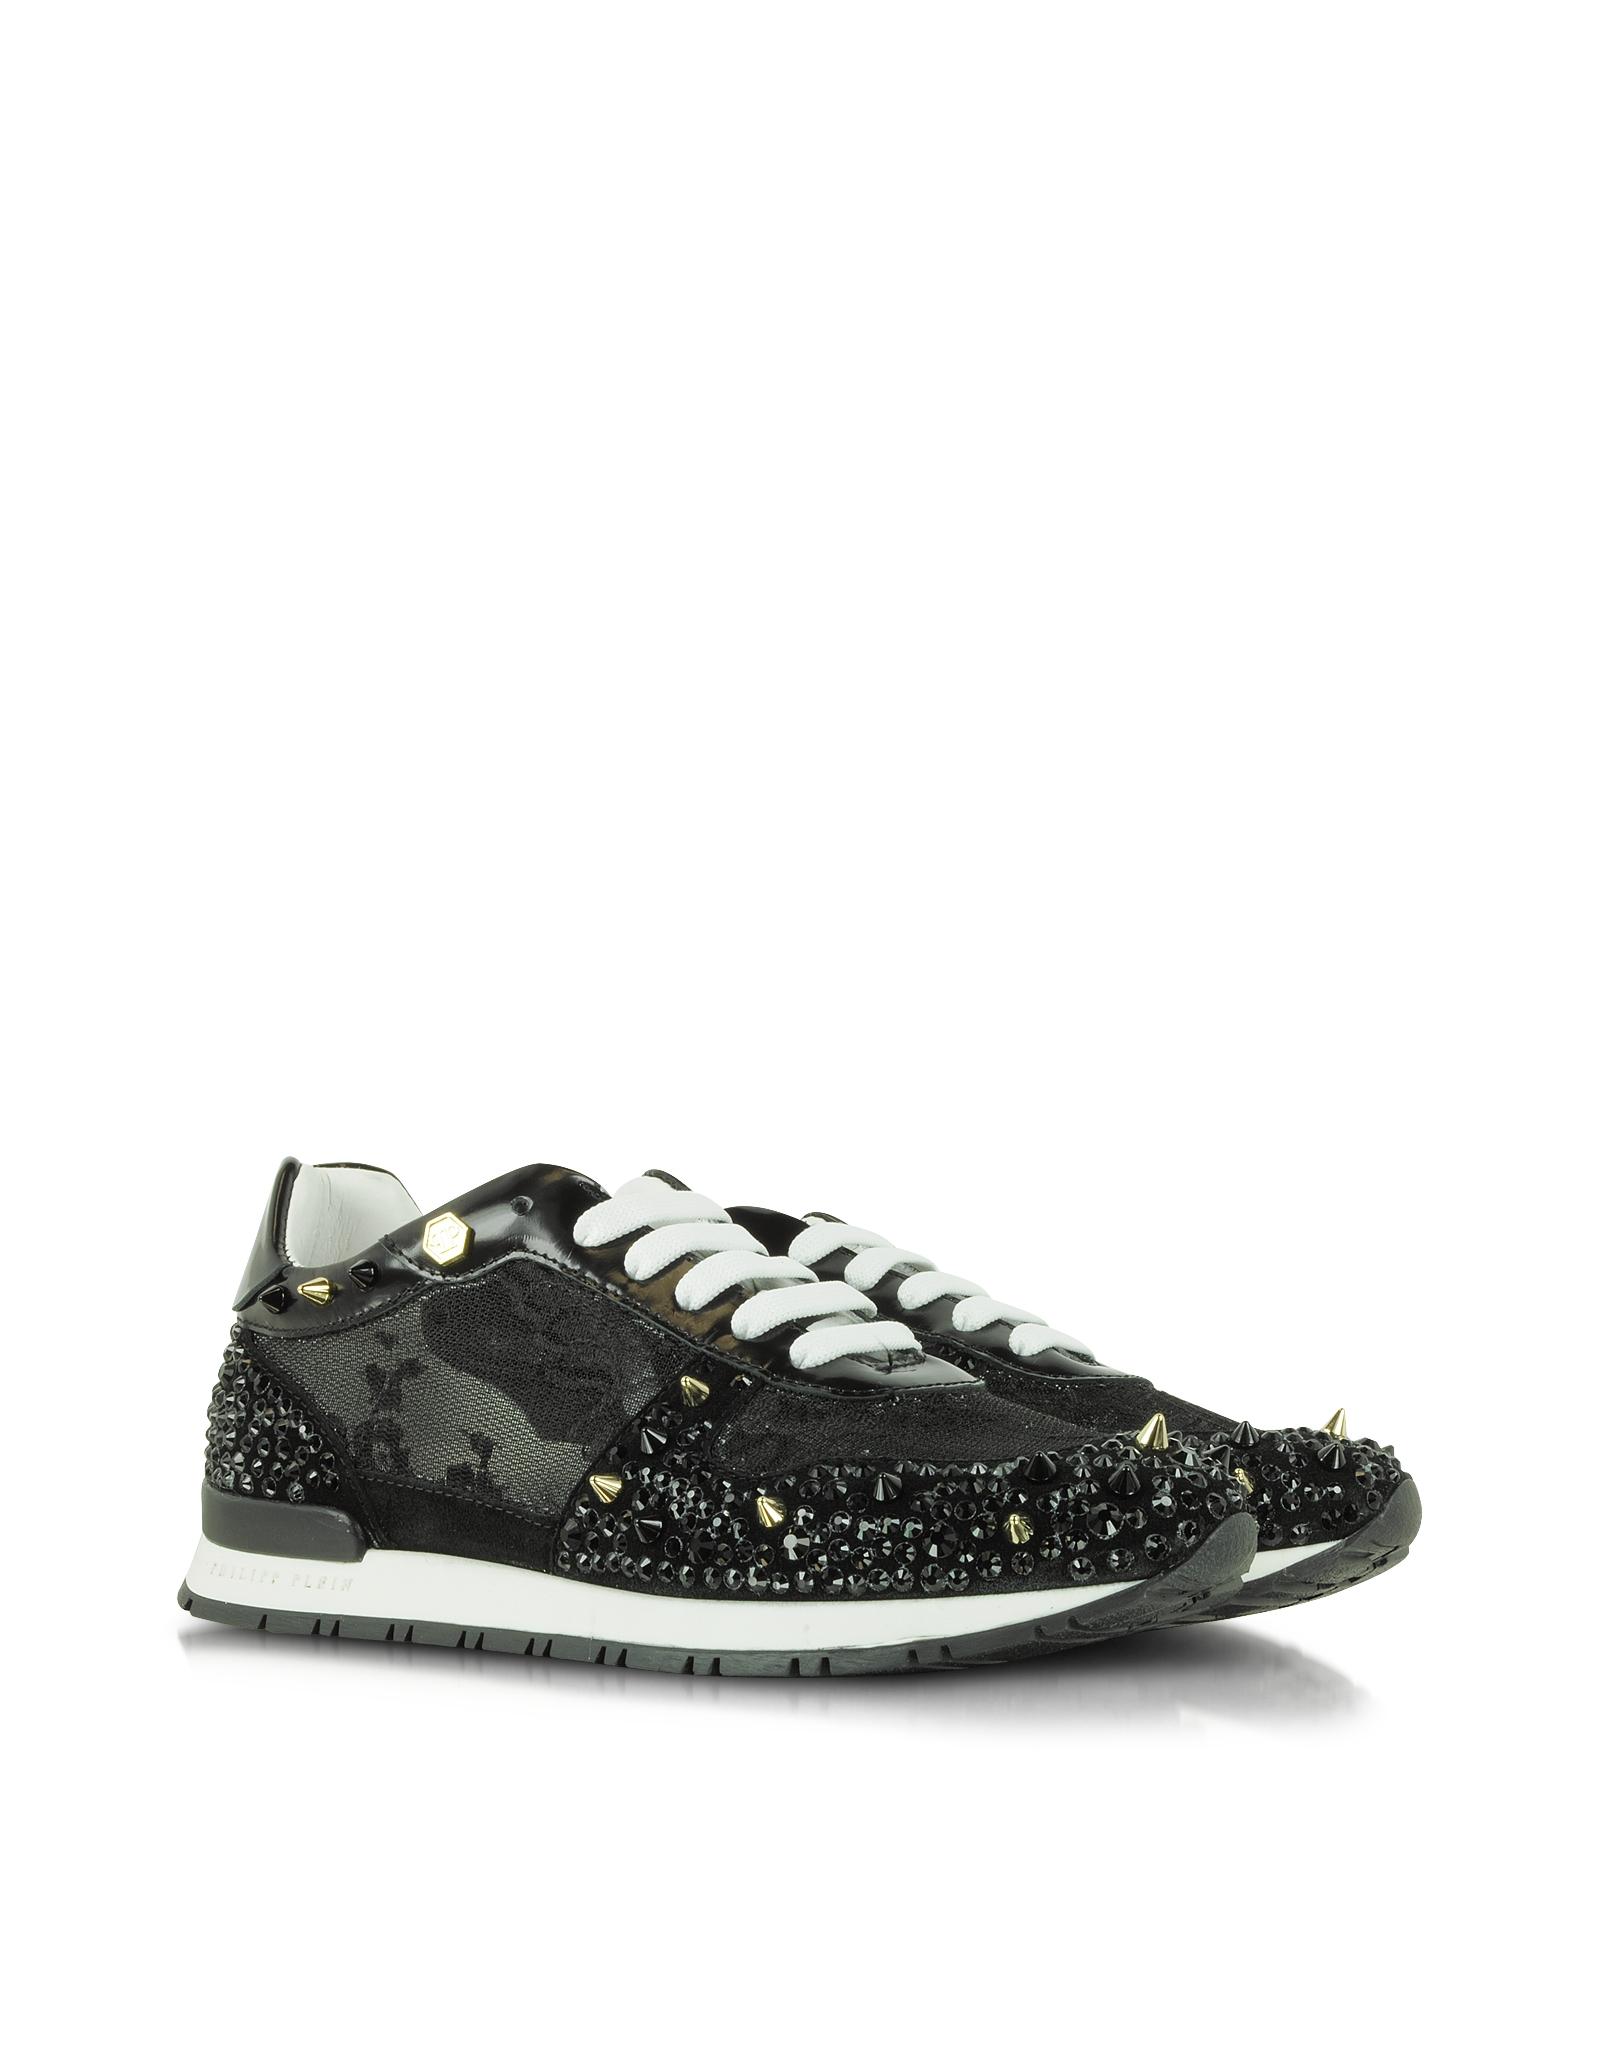 philipp plein glitter hi top sneakers in black lyst